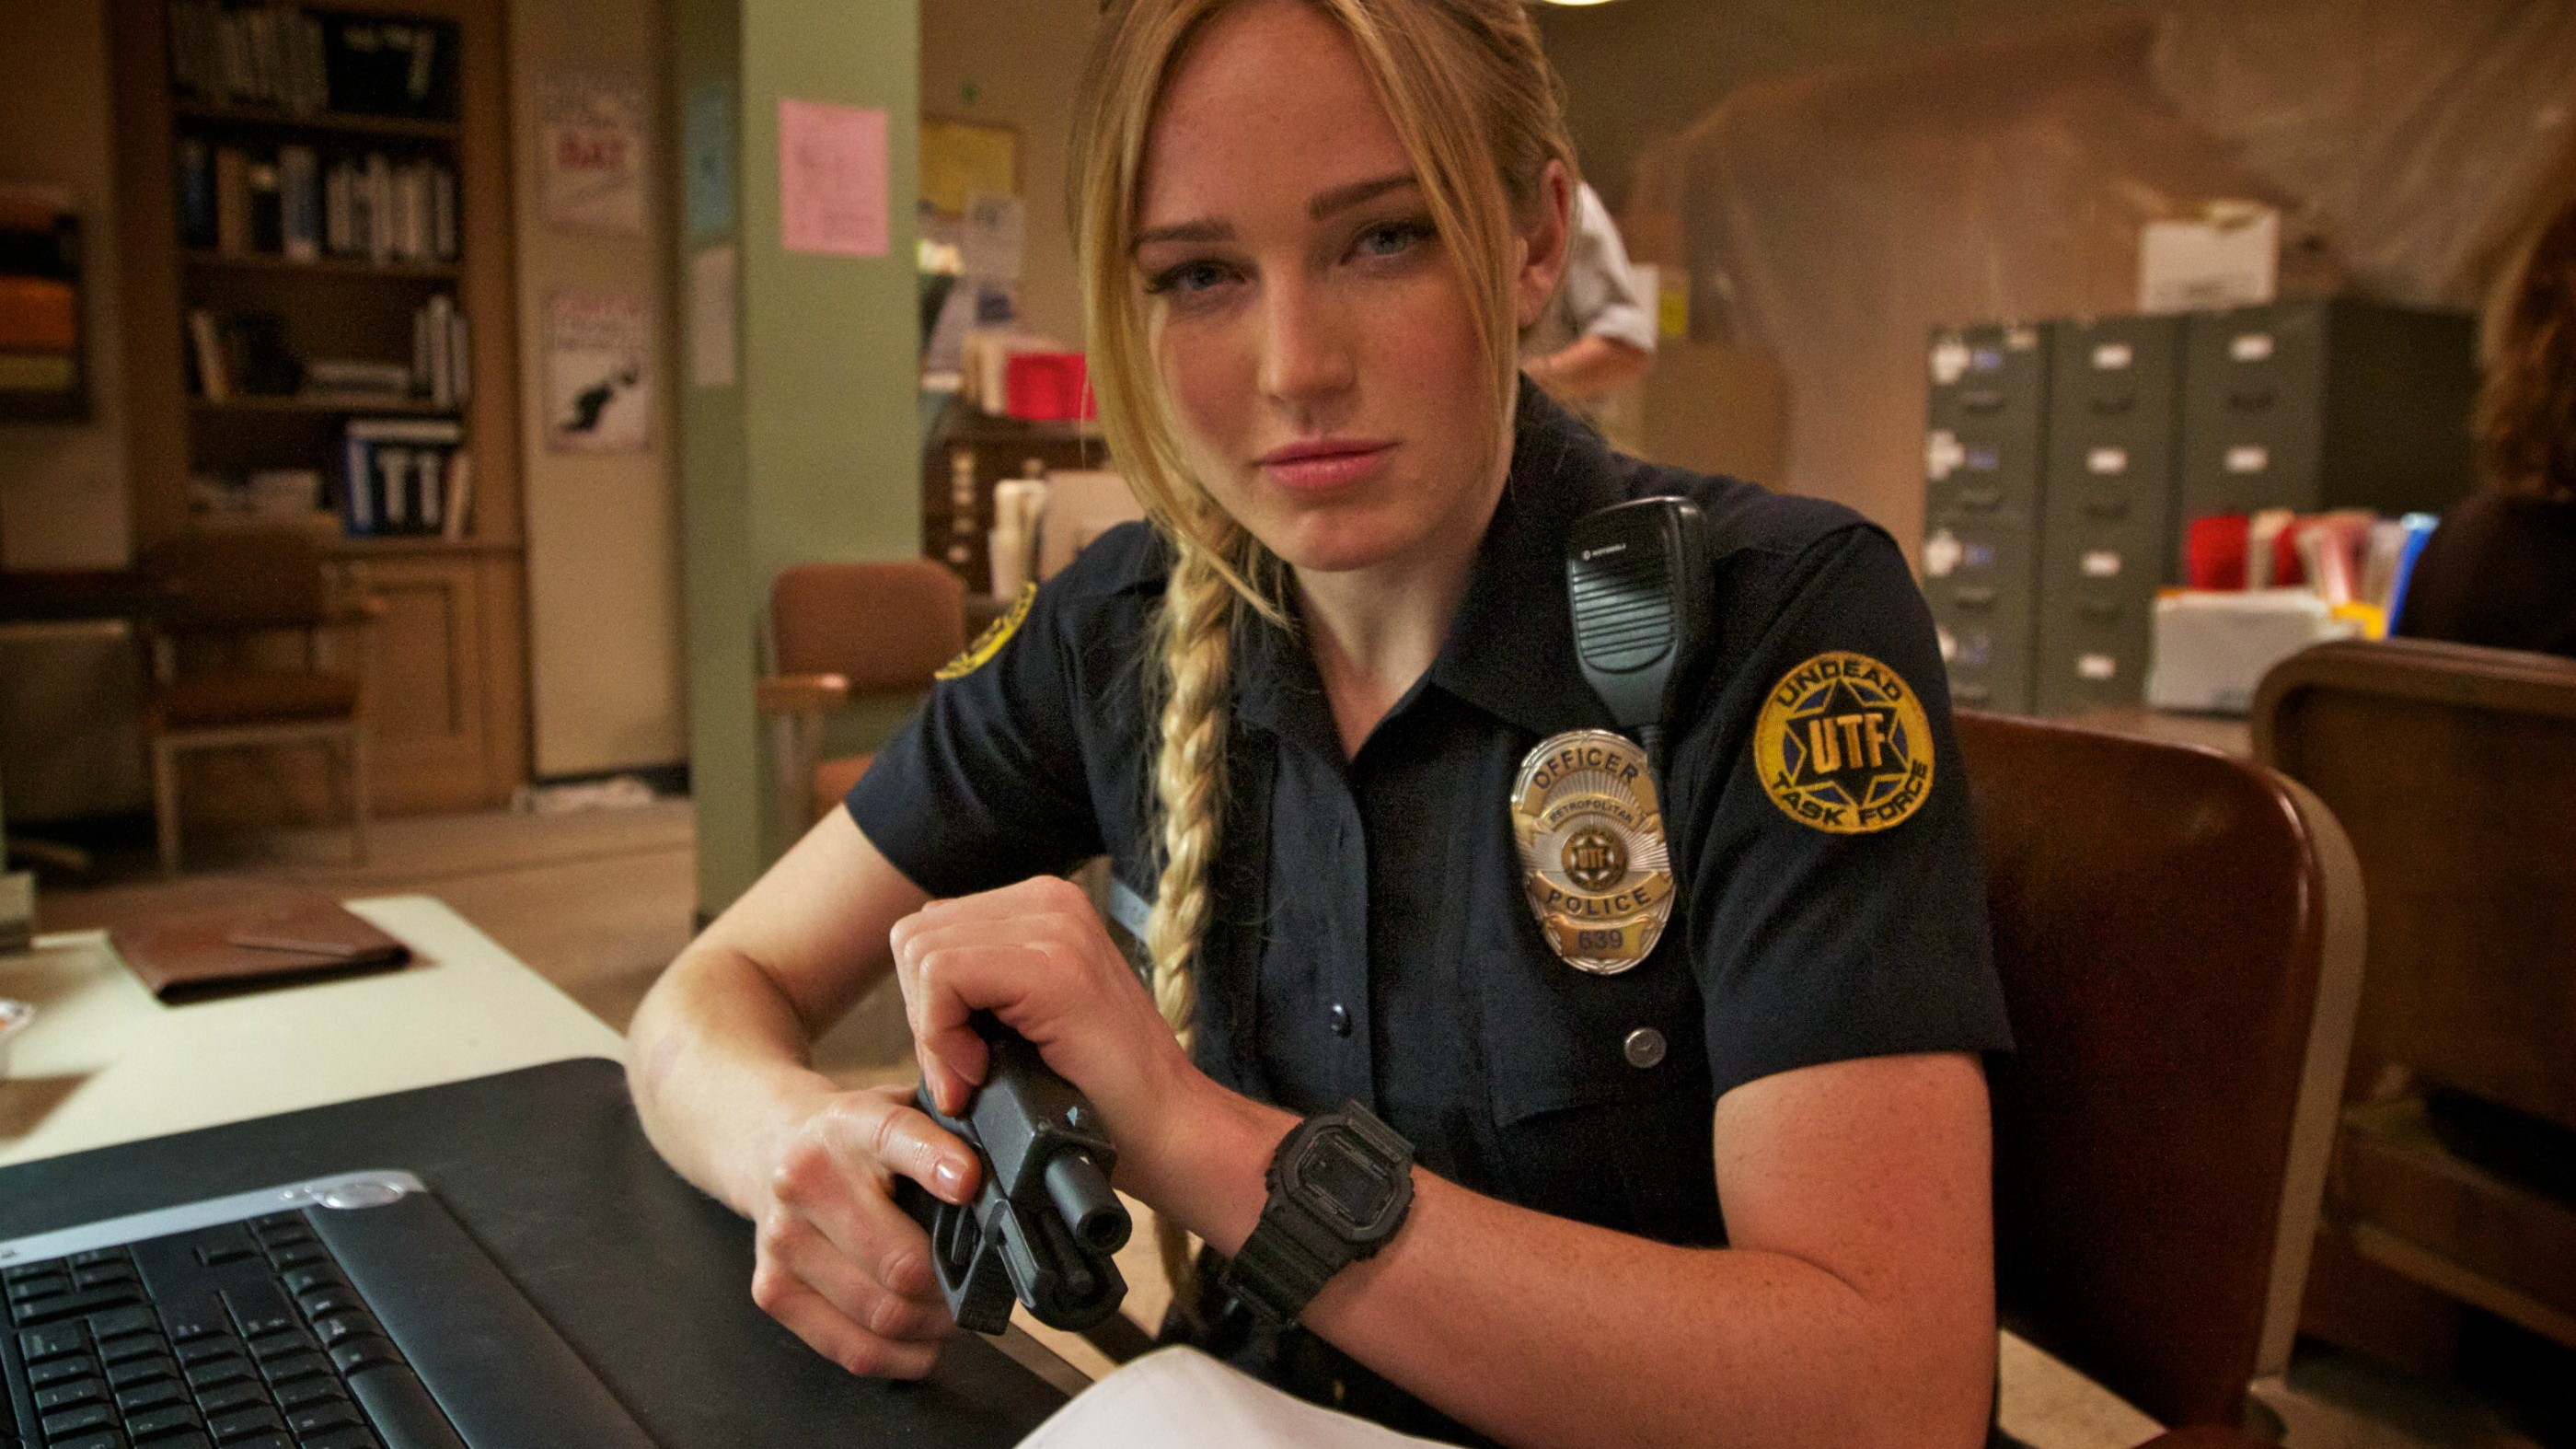 People 2799x1574 Caity Lotz blonde police Glock 17 Death Valley USA police women girls with guns braids